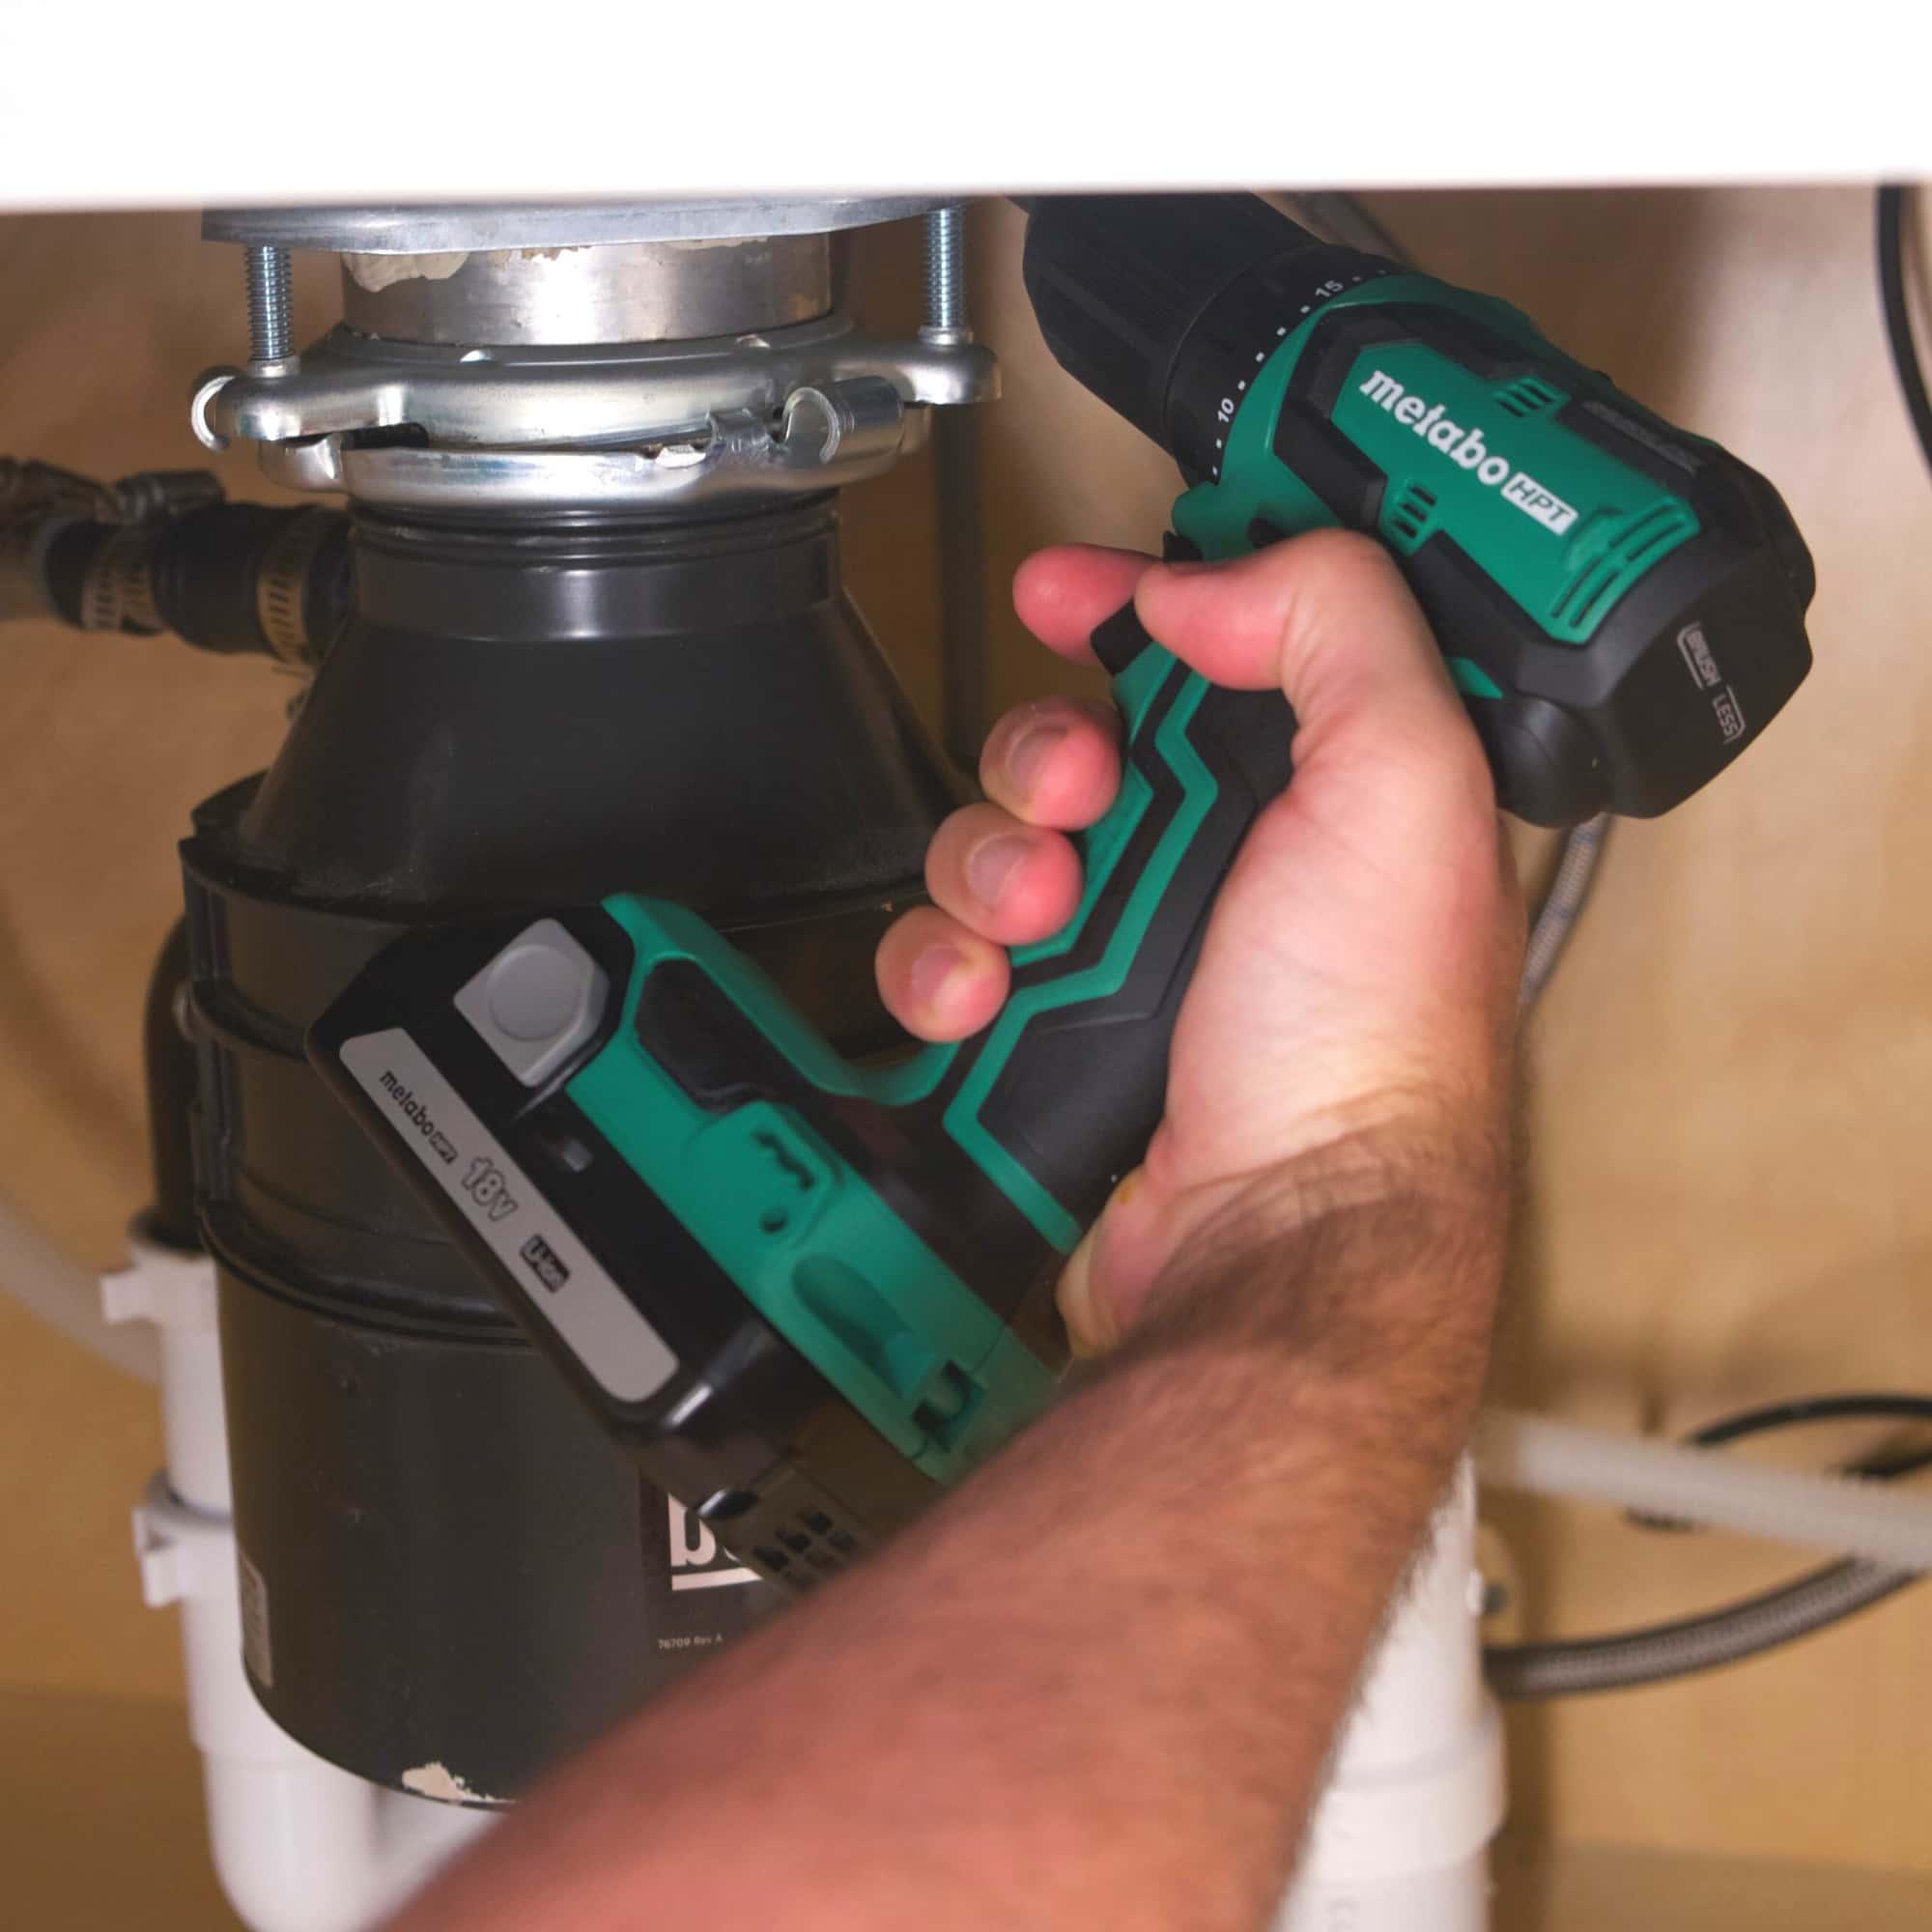 Subcompact Cordless Drill